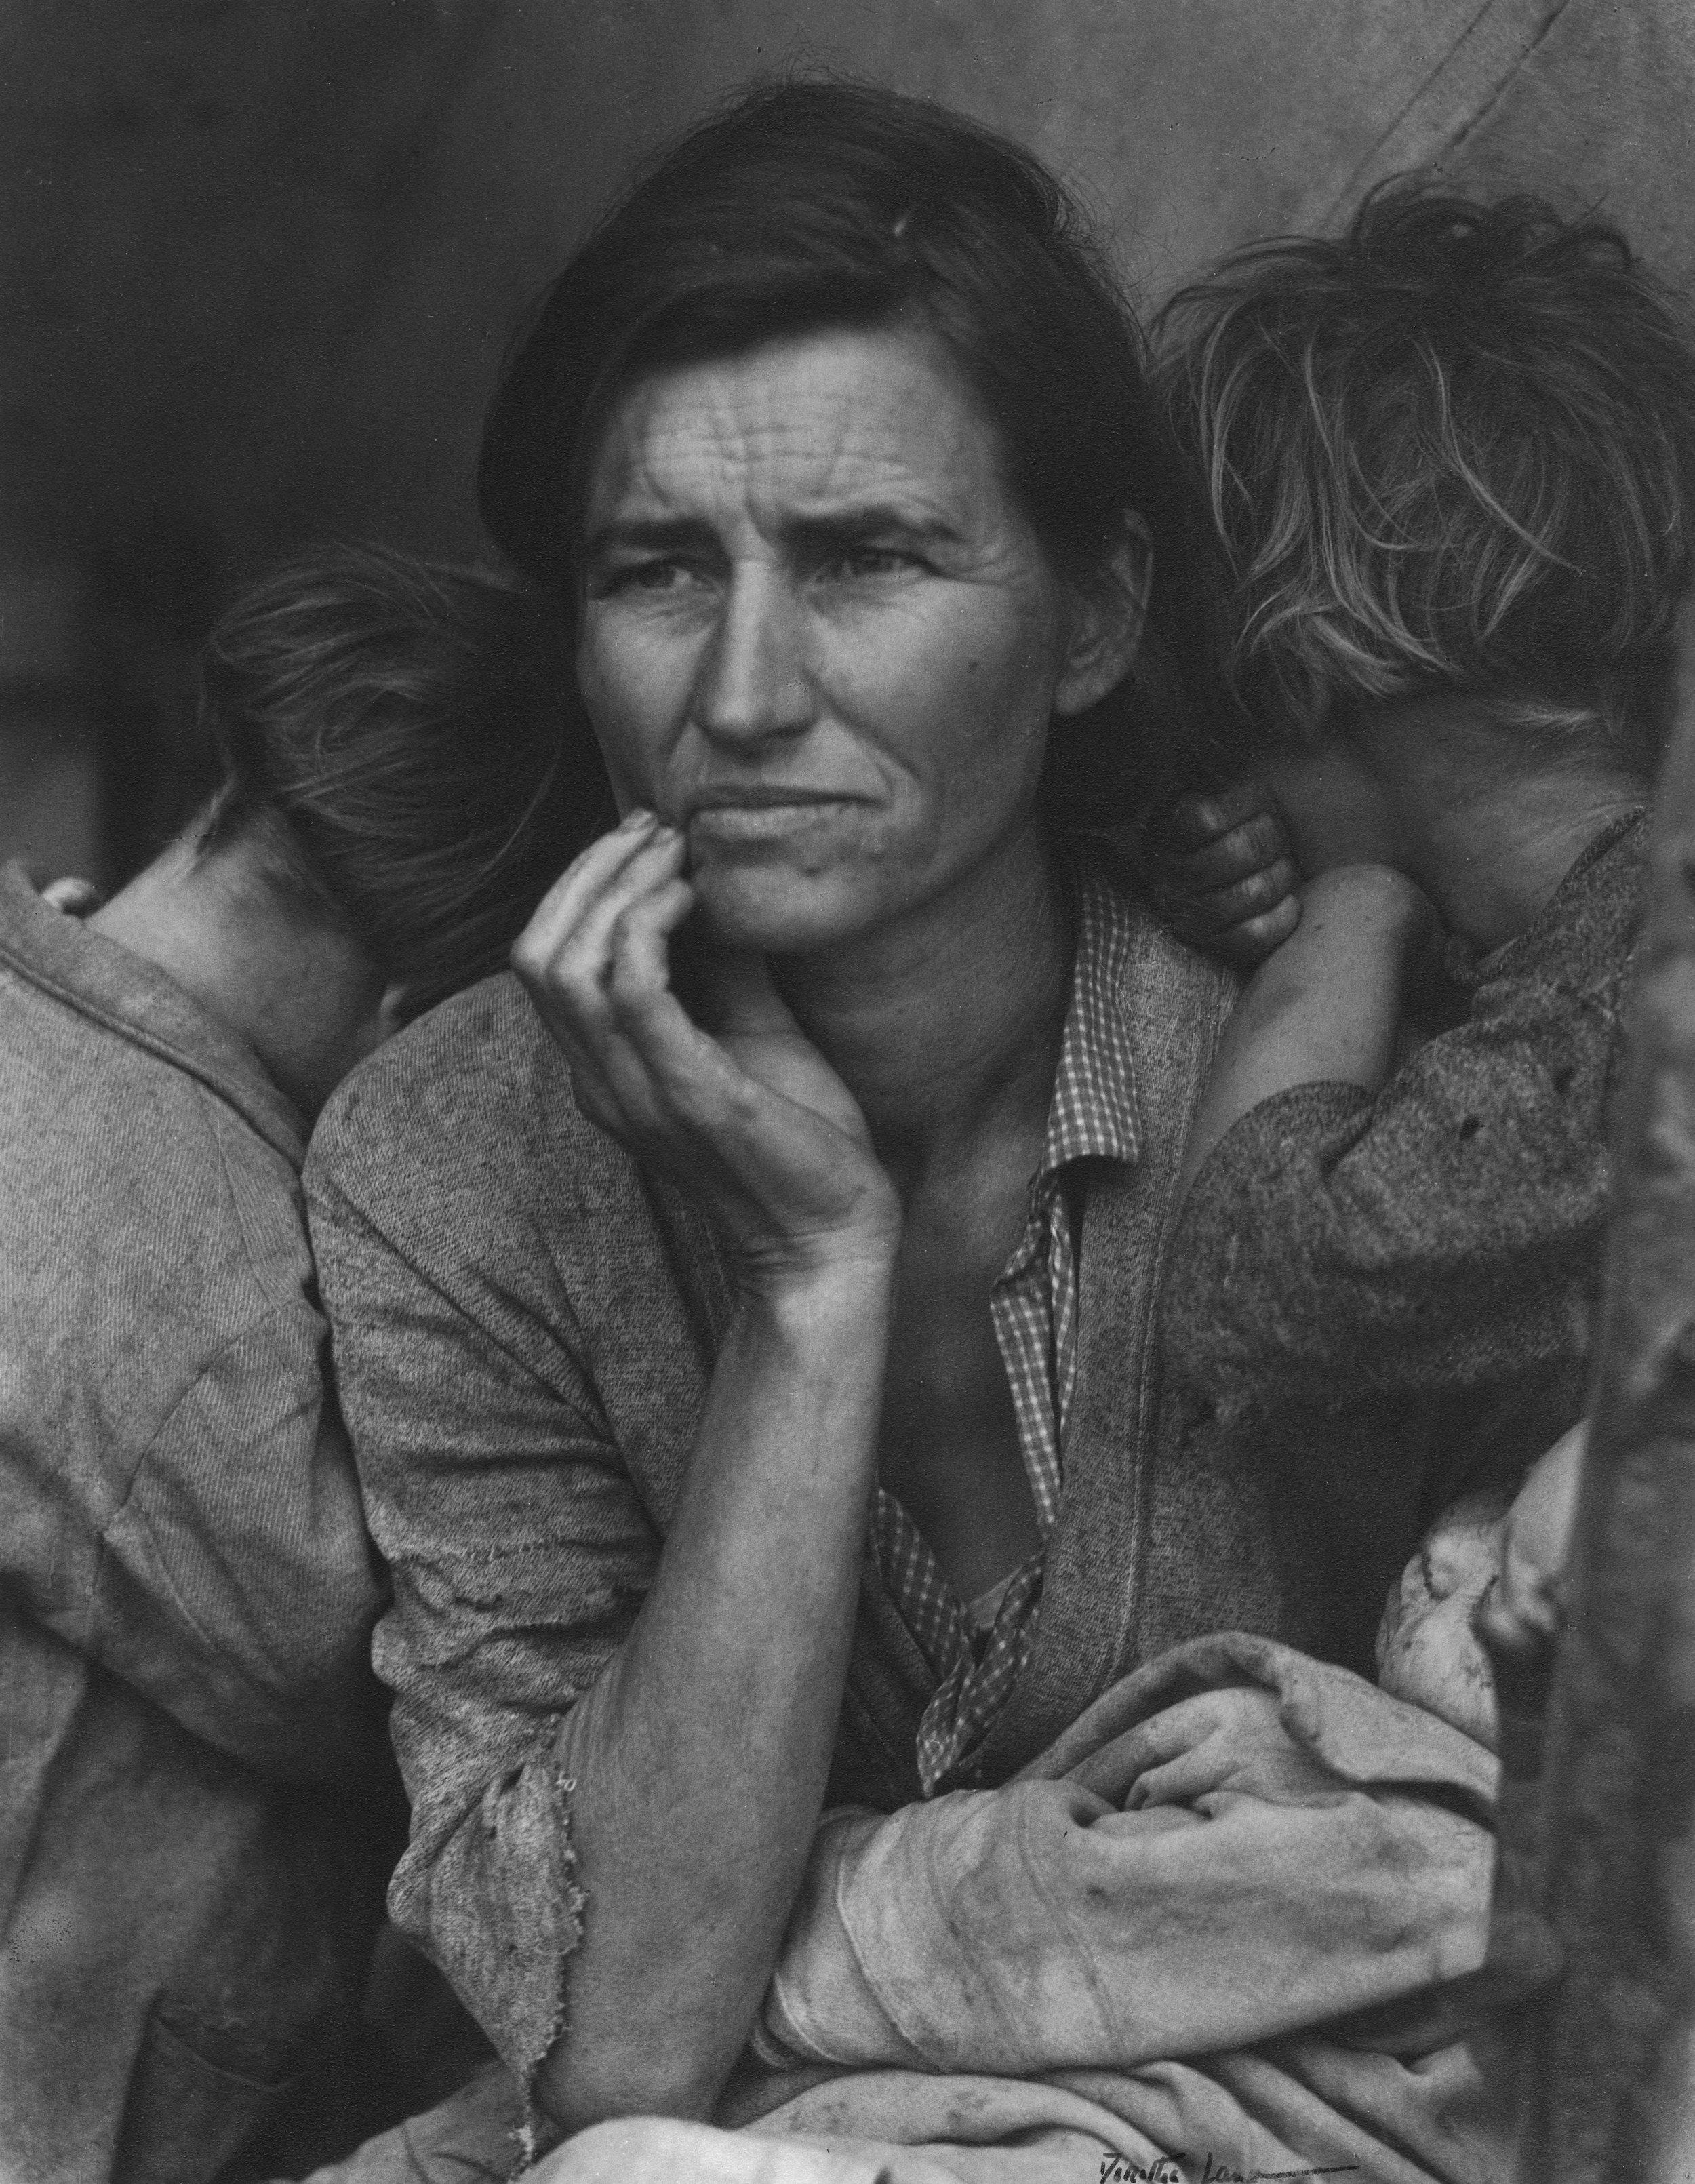 Migrant Mother, Nipomo, California, 1936, the Oakland Museum of California. ©Dorothea Lange